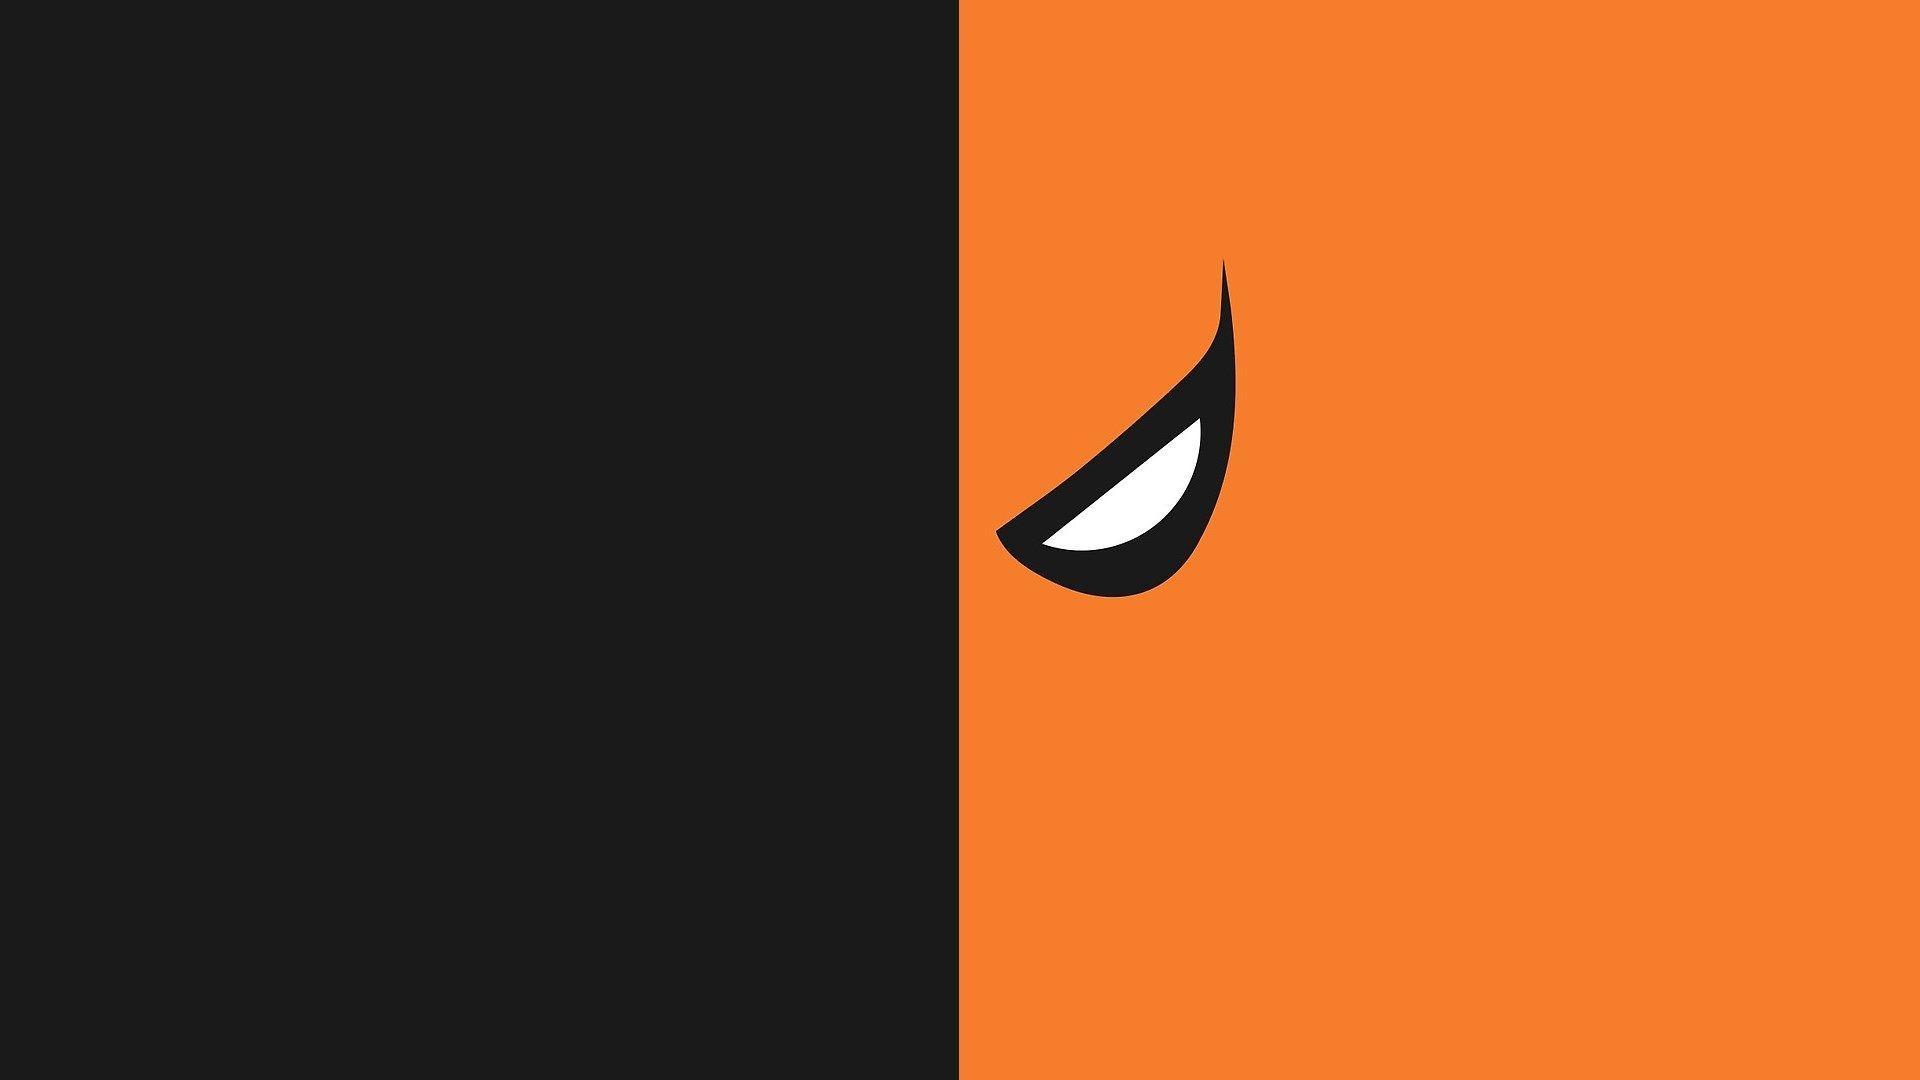 Deathstroke Logo Wallpapers - Top Free